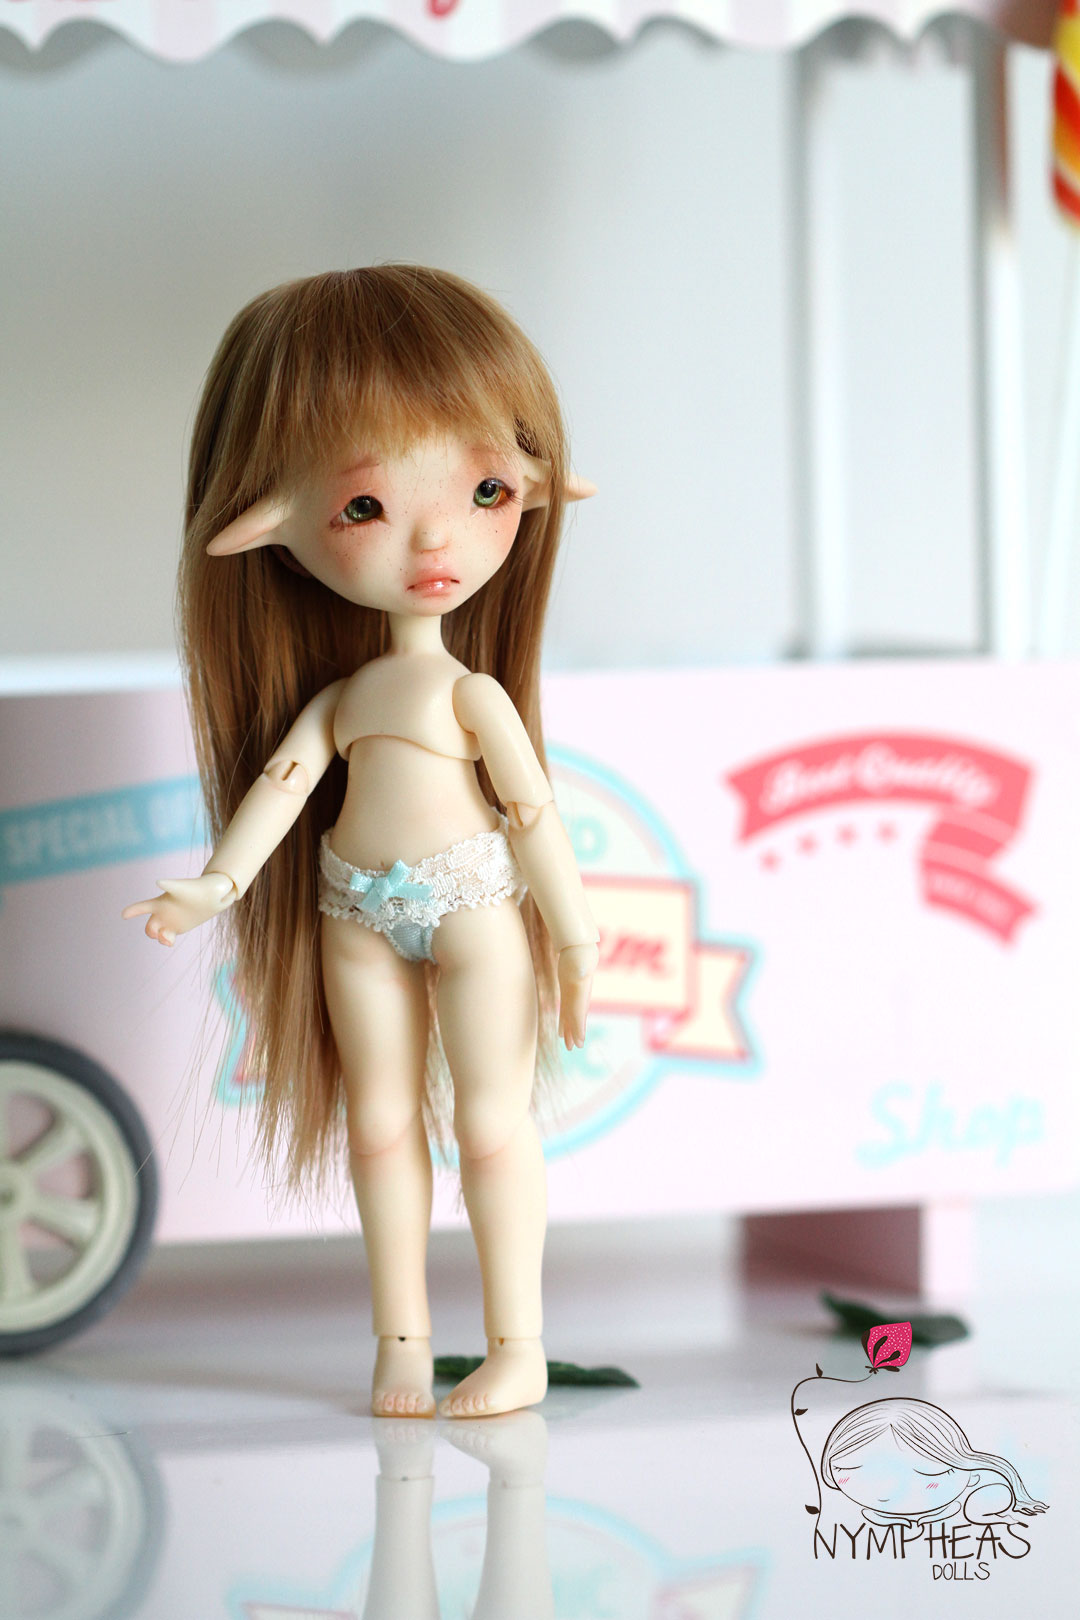 [NYMPHEAS DOLLS] Tit'herbe & Tit'Fleur Snow P35 - Page 5 Malicie-cream-nympheas-dolls-024